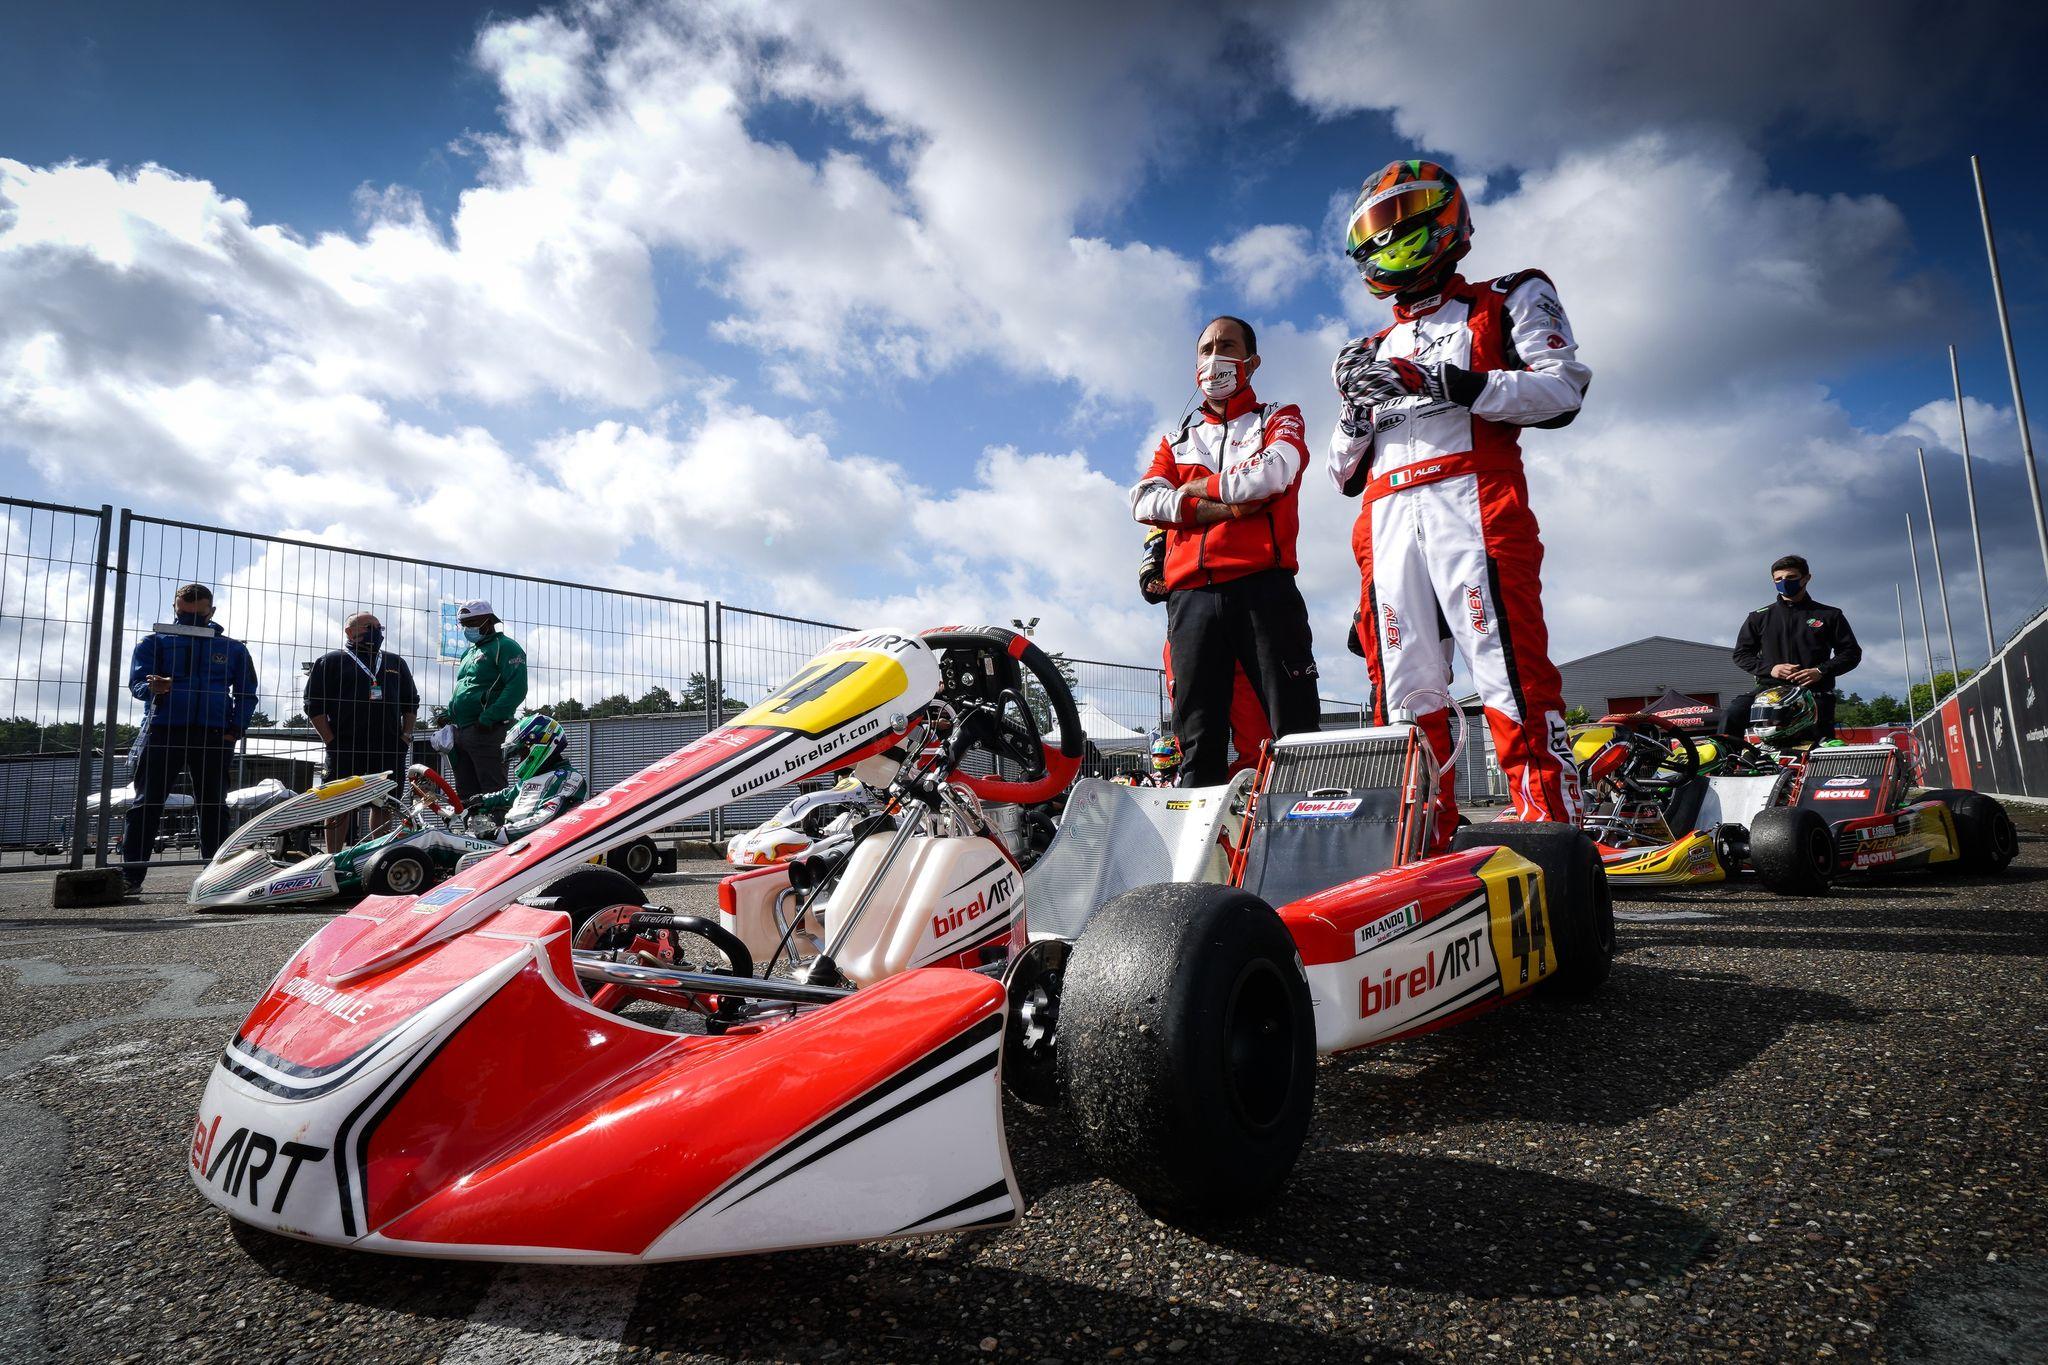 Alex Irlando a breath away from winning the European title